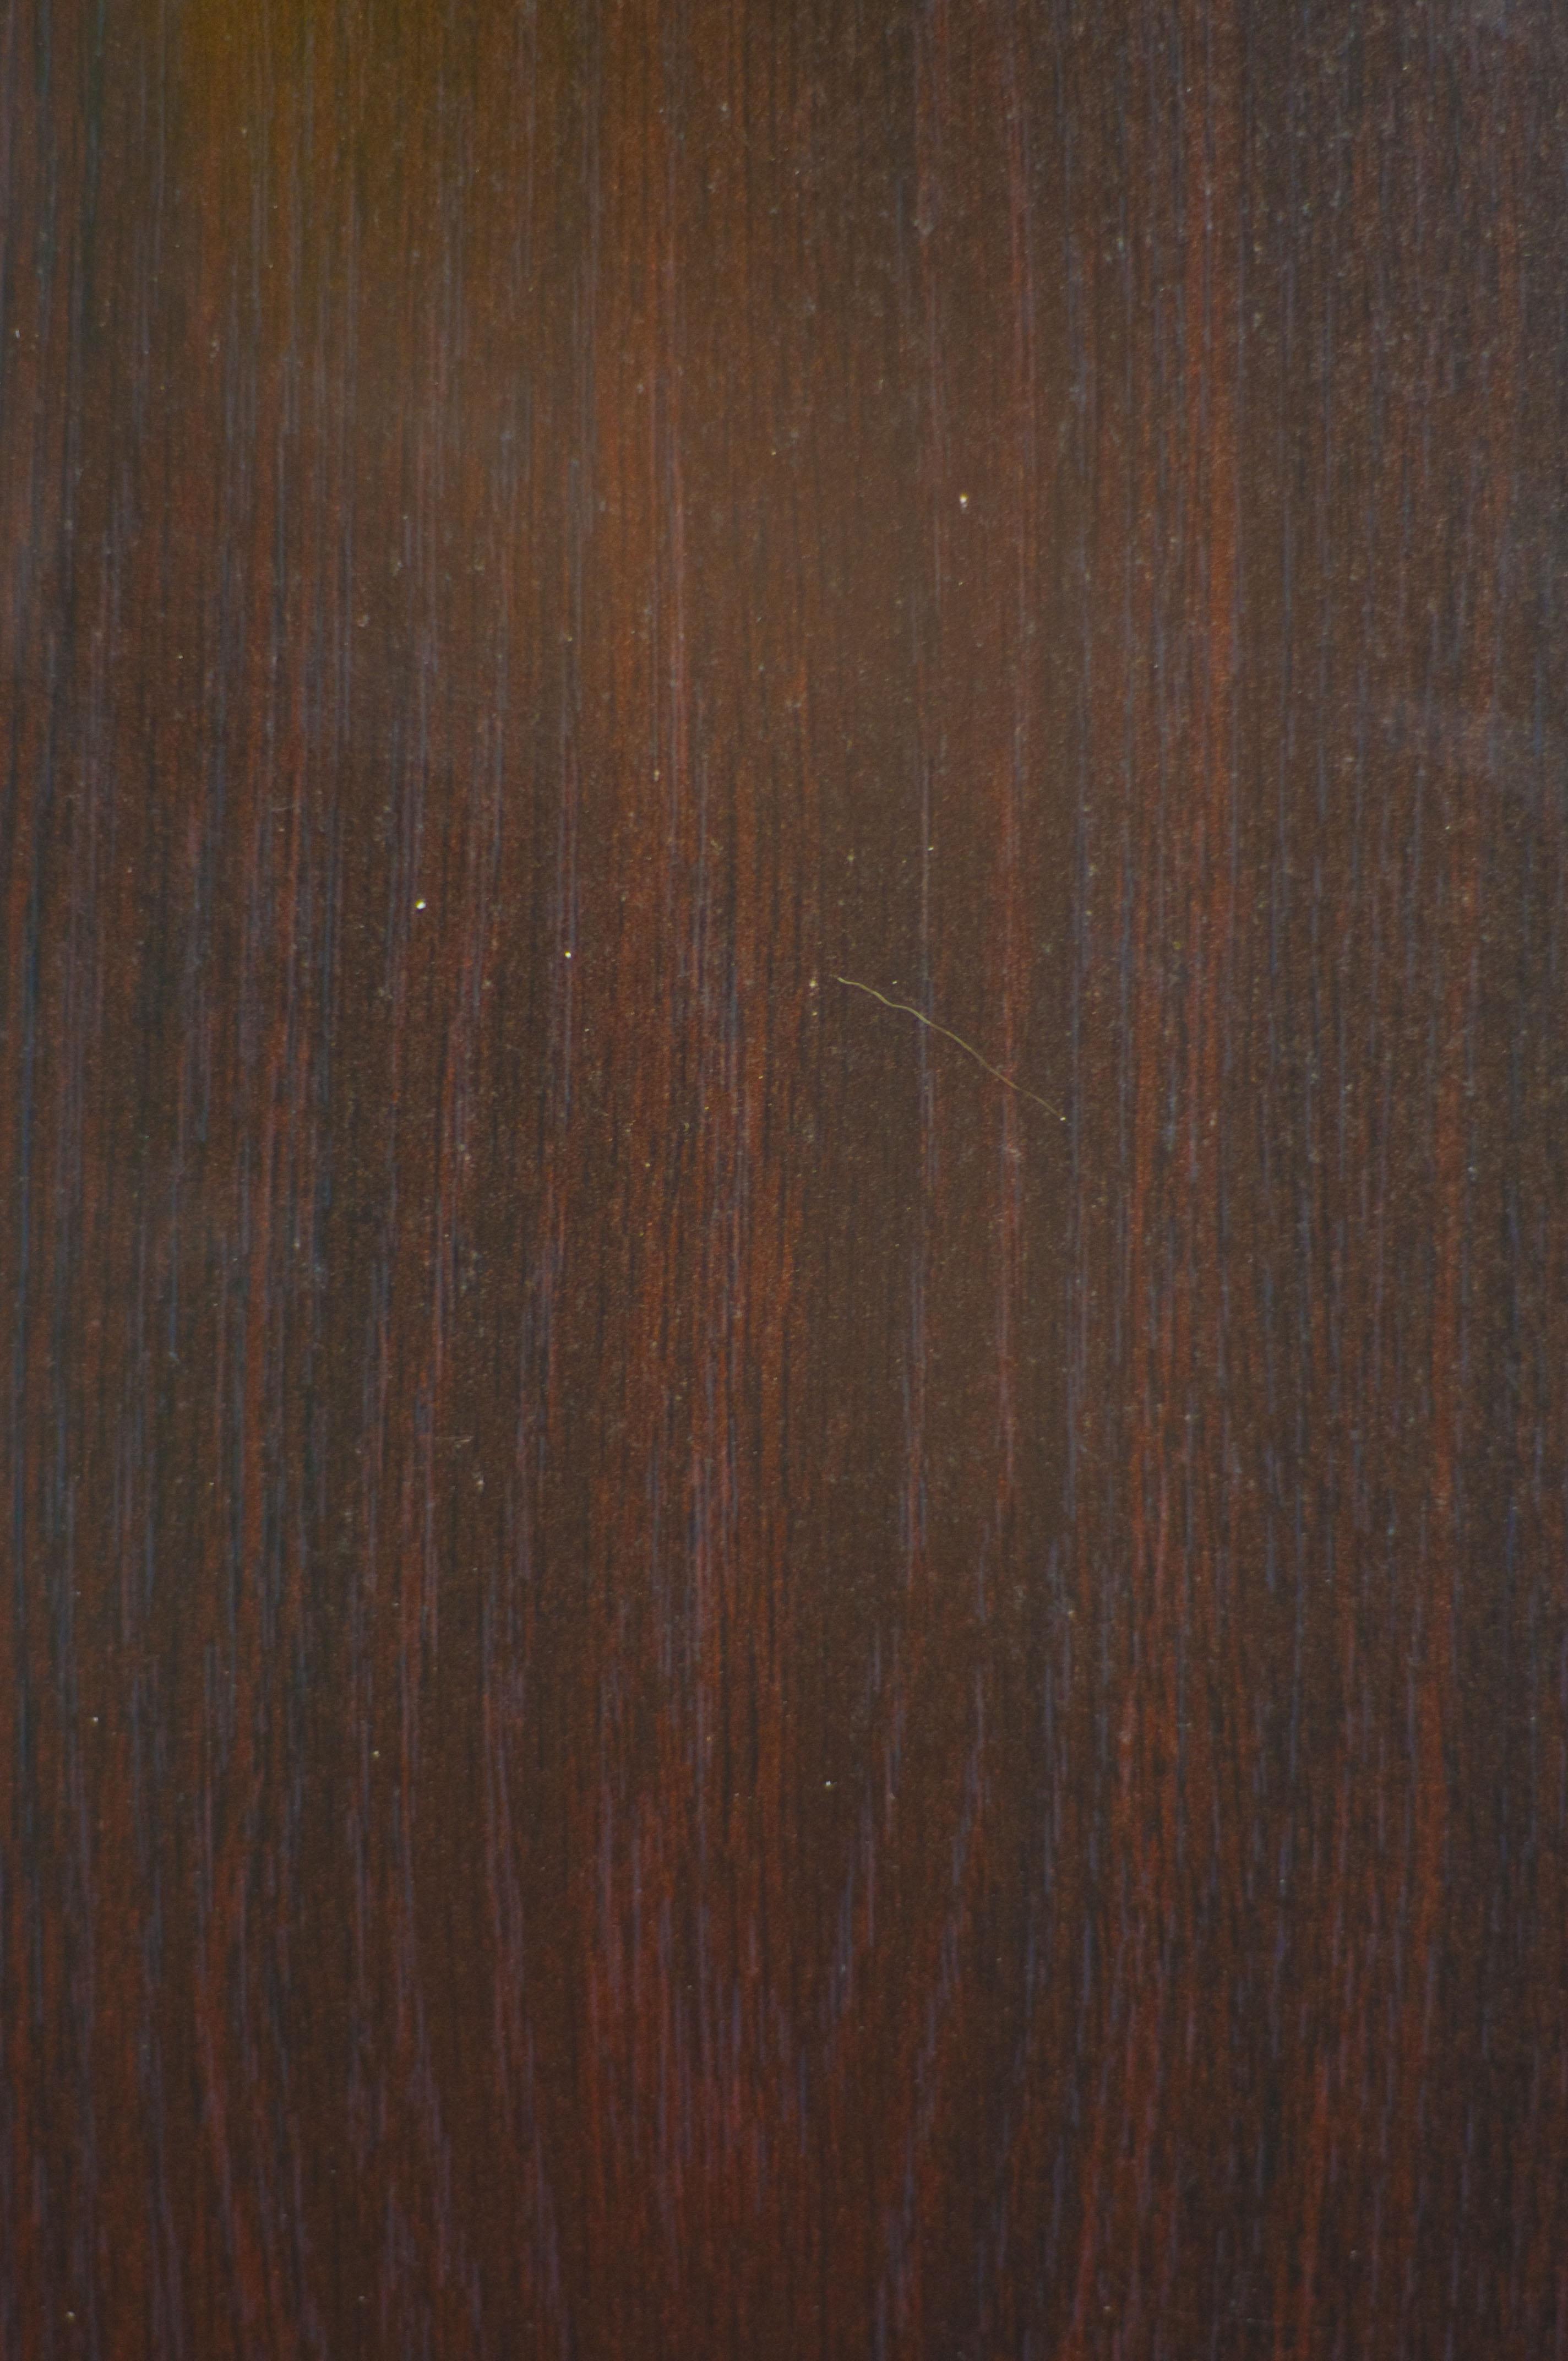 dark wood texture. Darkwood3.jpg 1.2 Mb [184 Download(s)]. Texture Pack: Dark Wood Textures